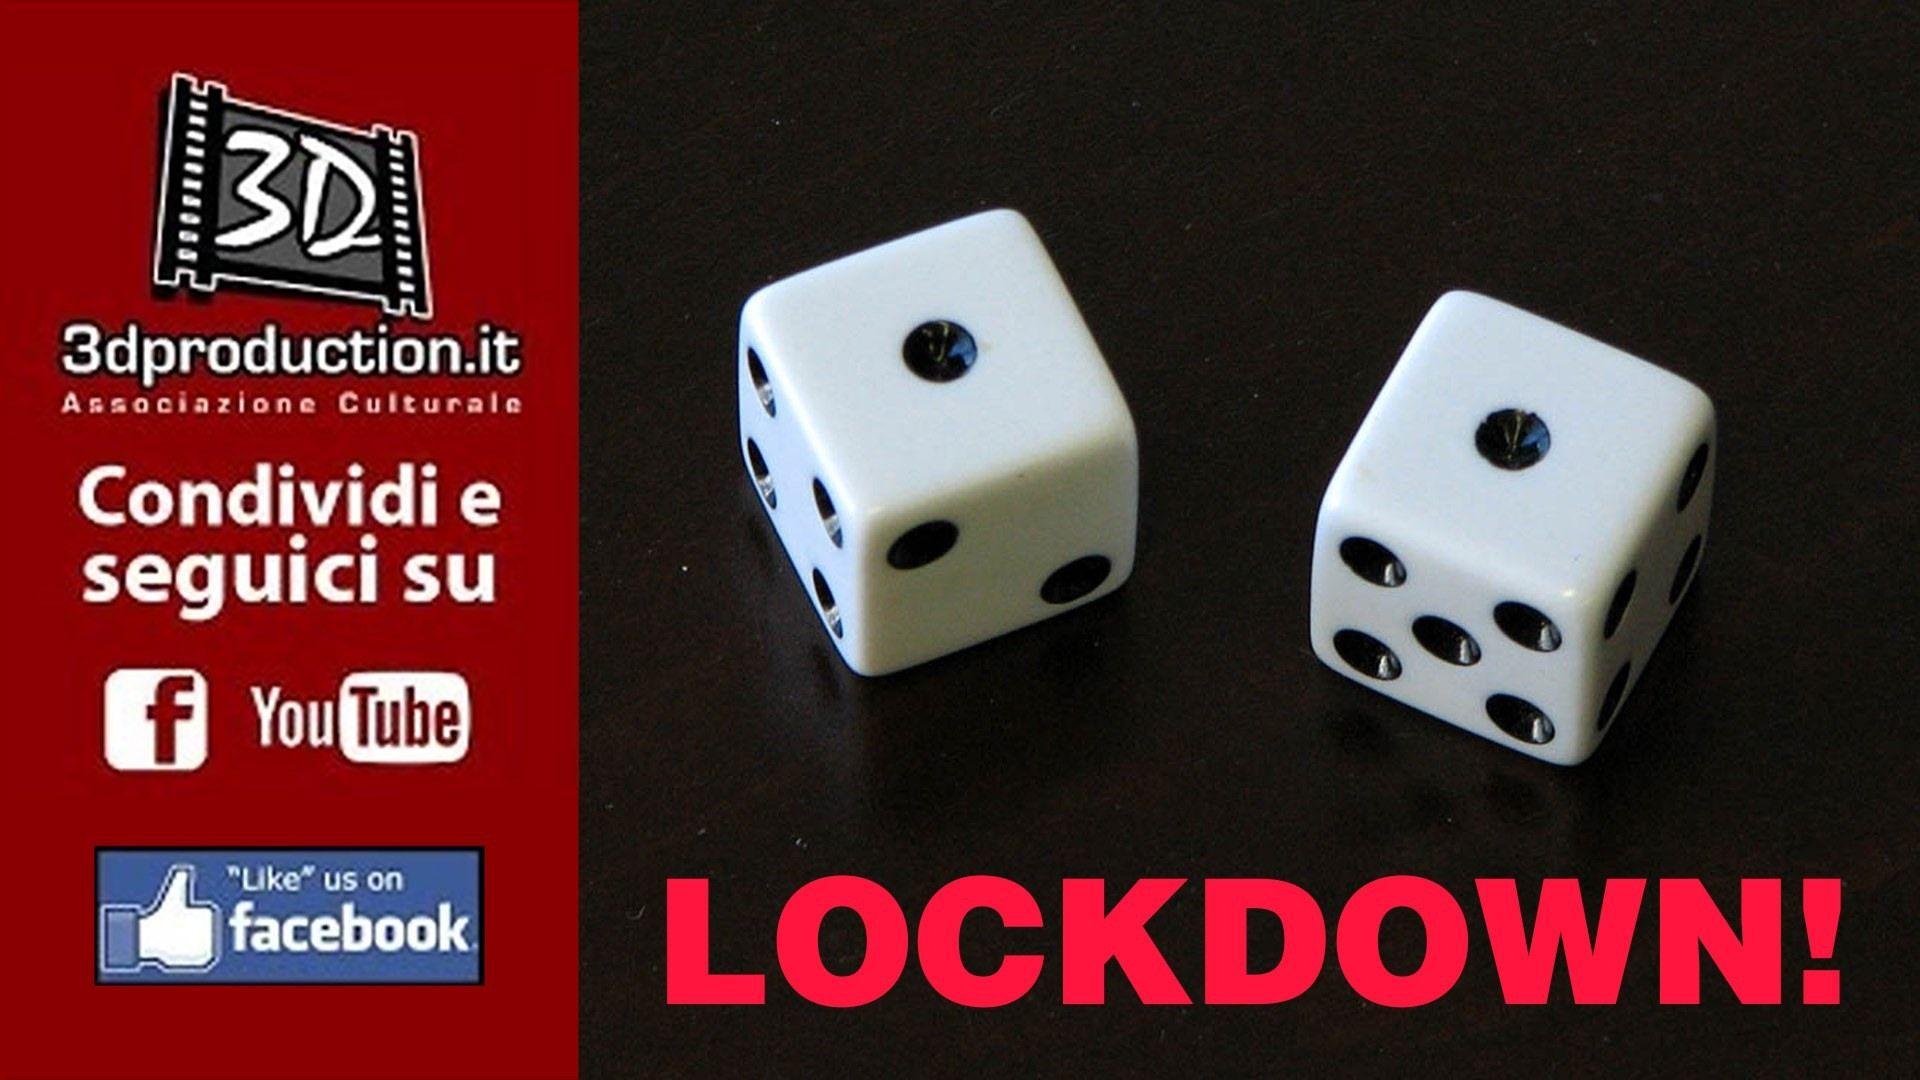 LOCKDOWN!